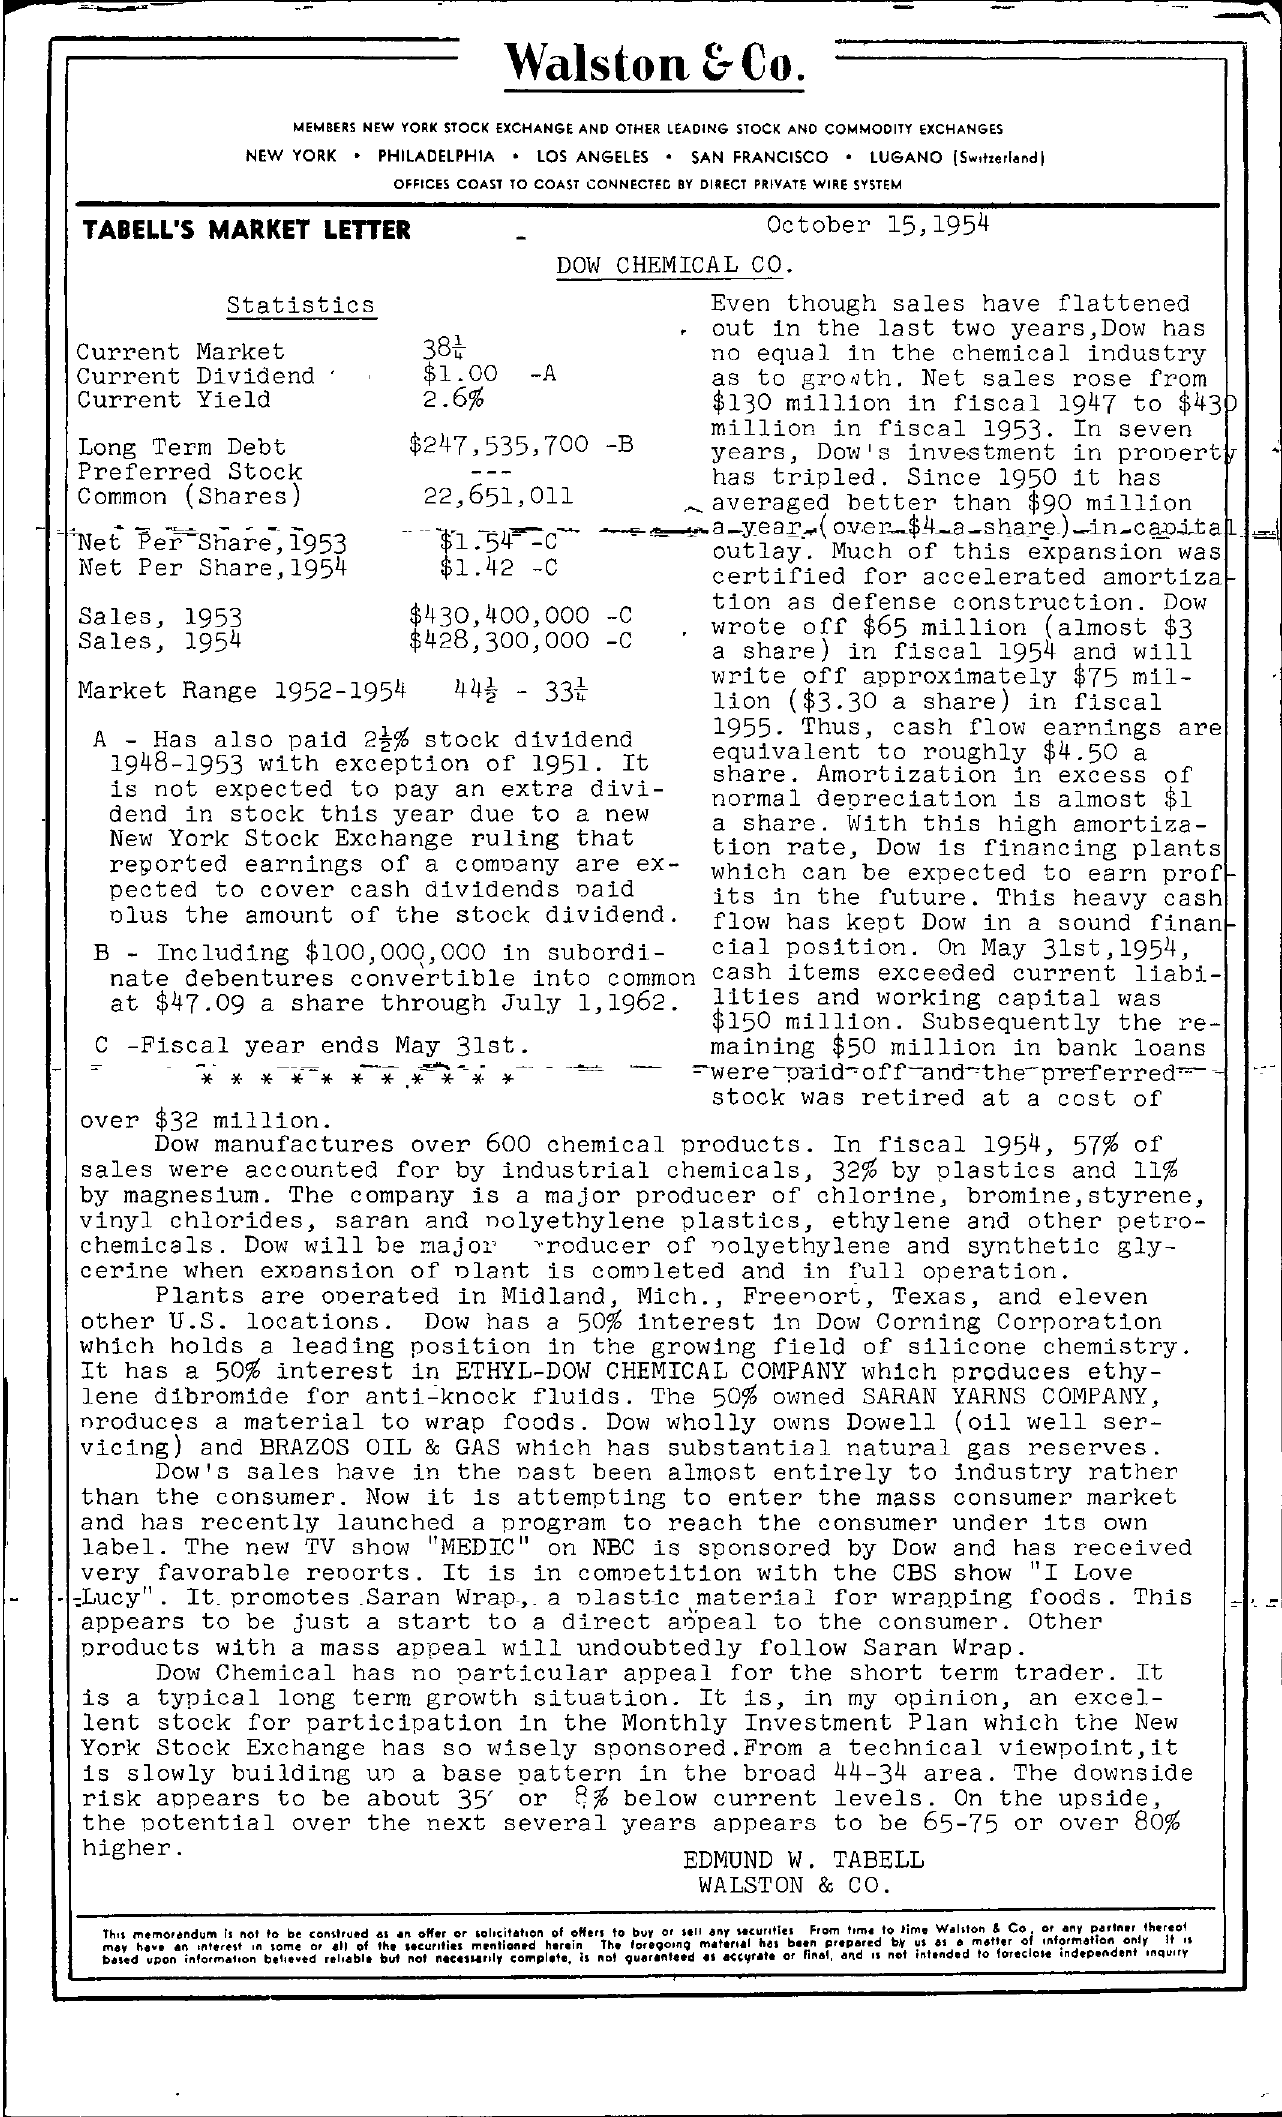 Tabell's Market Letter - October 15, 1954